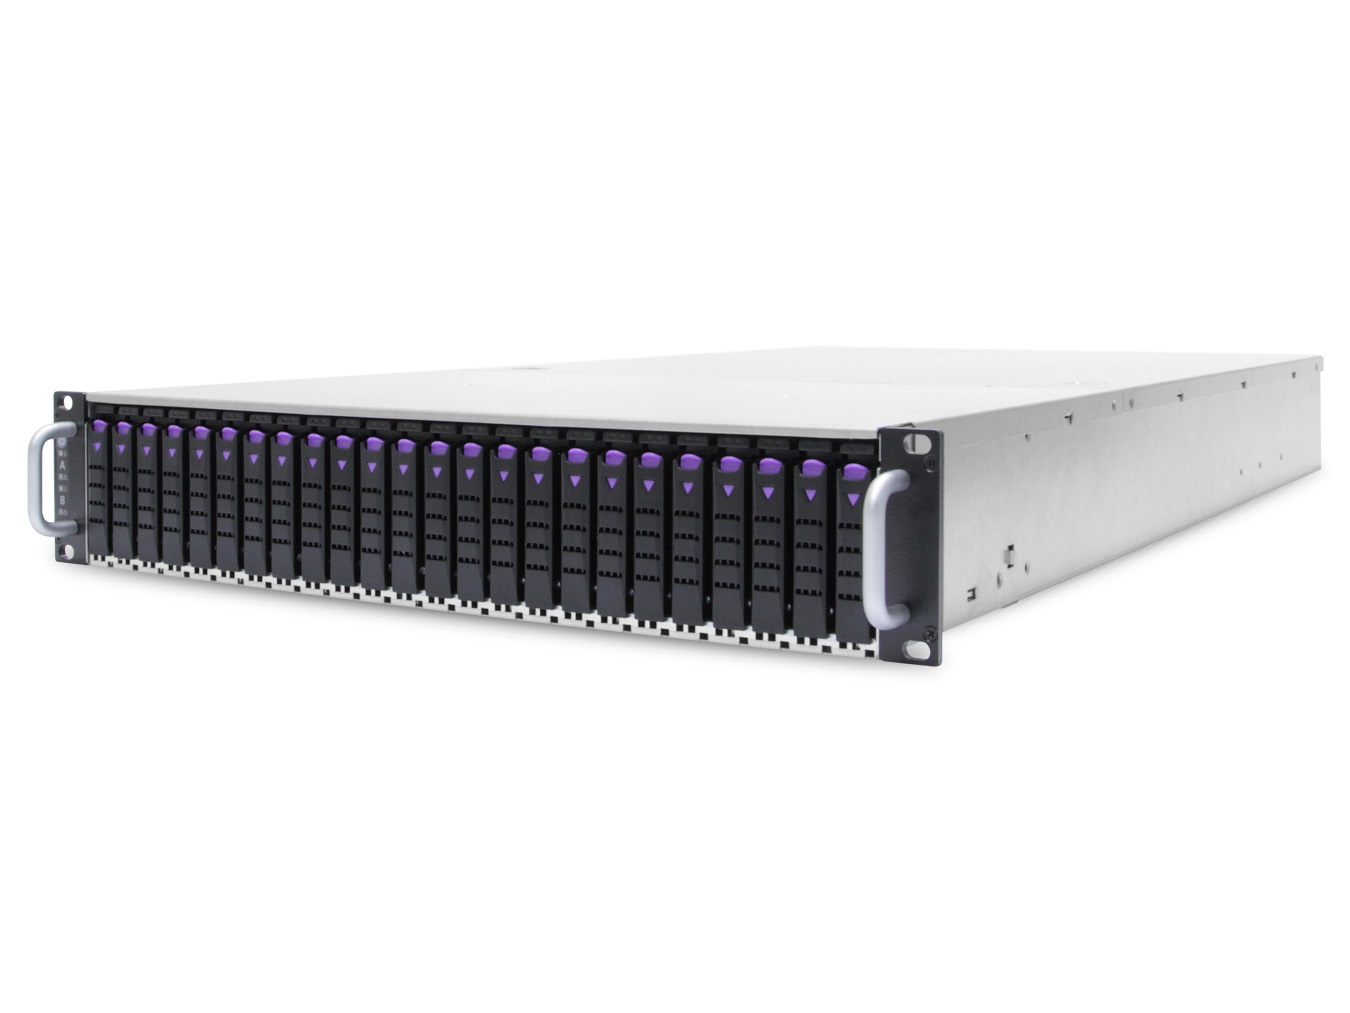 AIC HA202-PH XP1-A202PH02 2U 24-Bay NVMe Storage Server